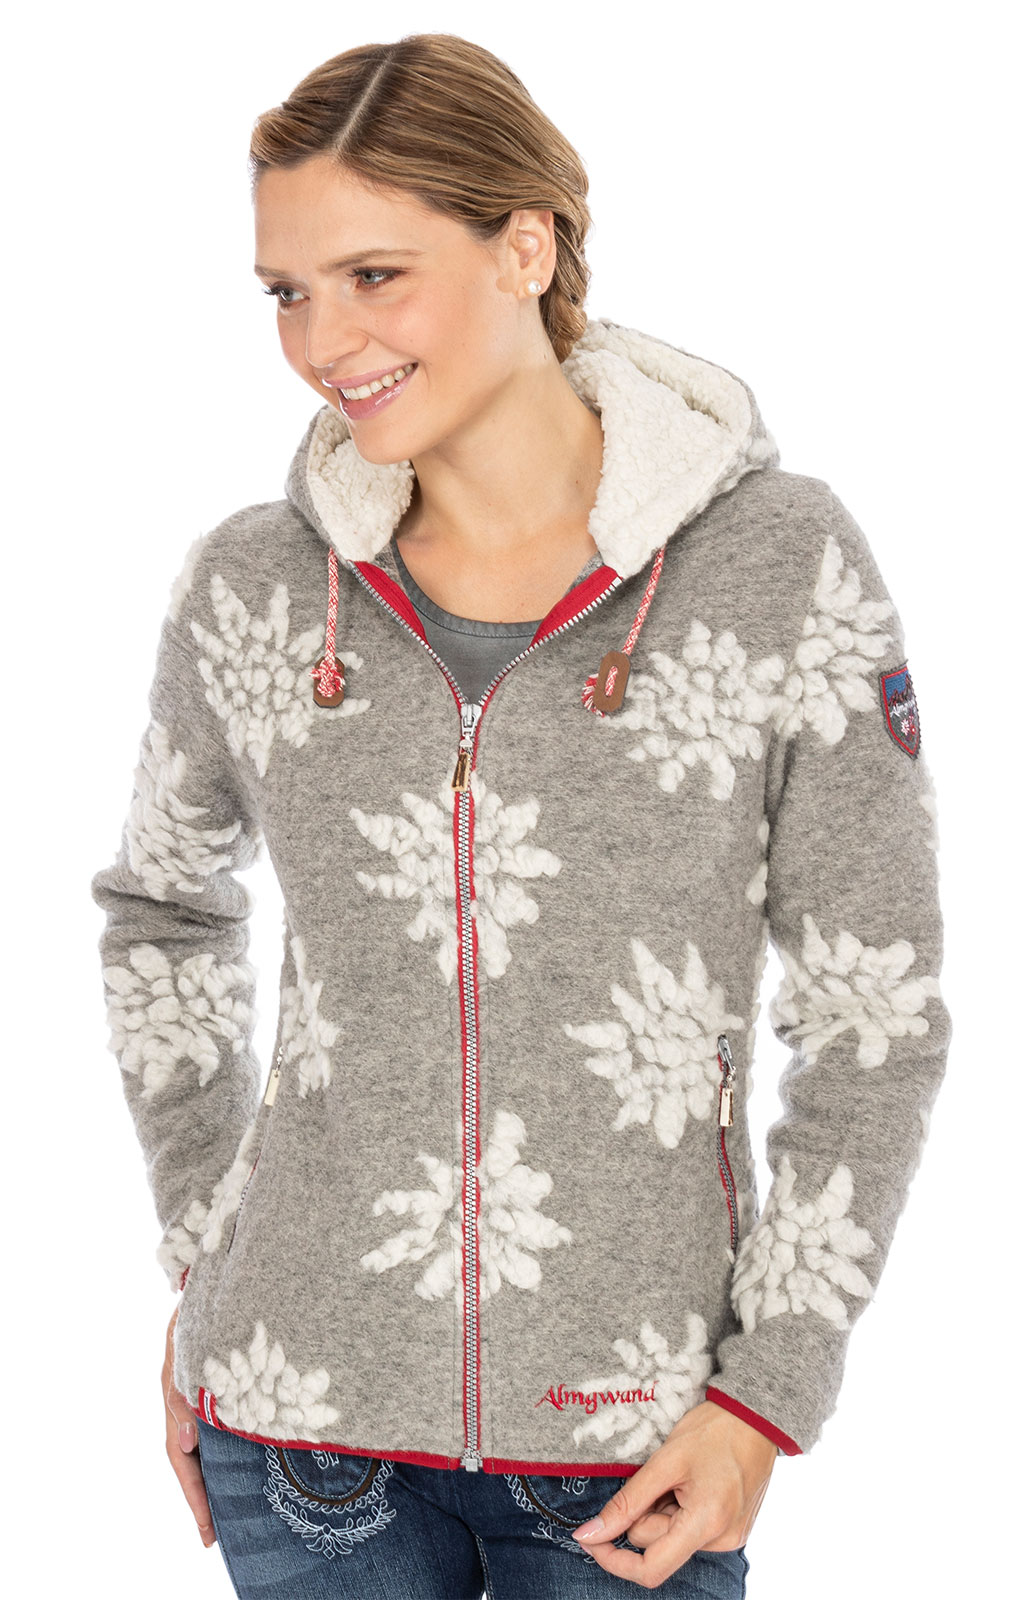 Giacca in maglia WILDENKOGEL grigio von Almgwand